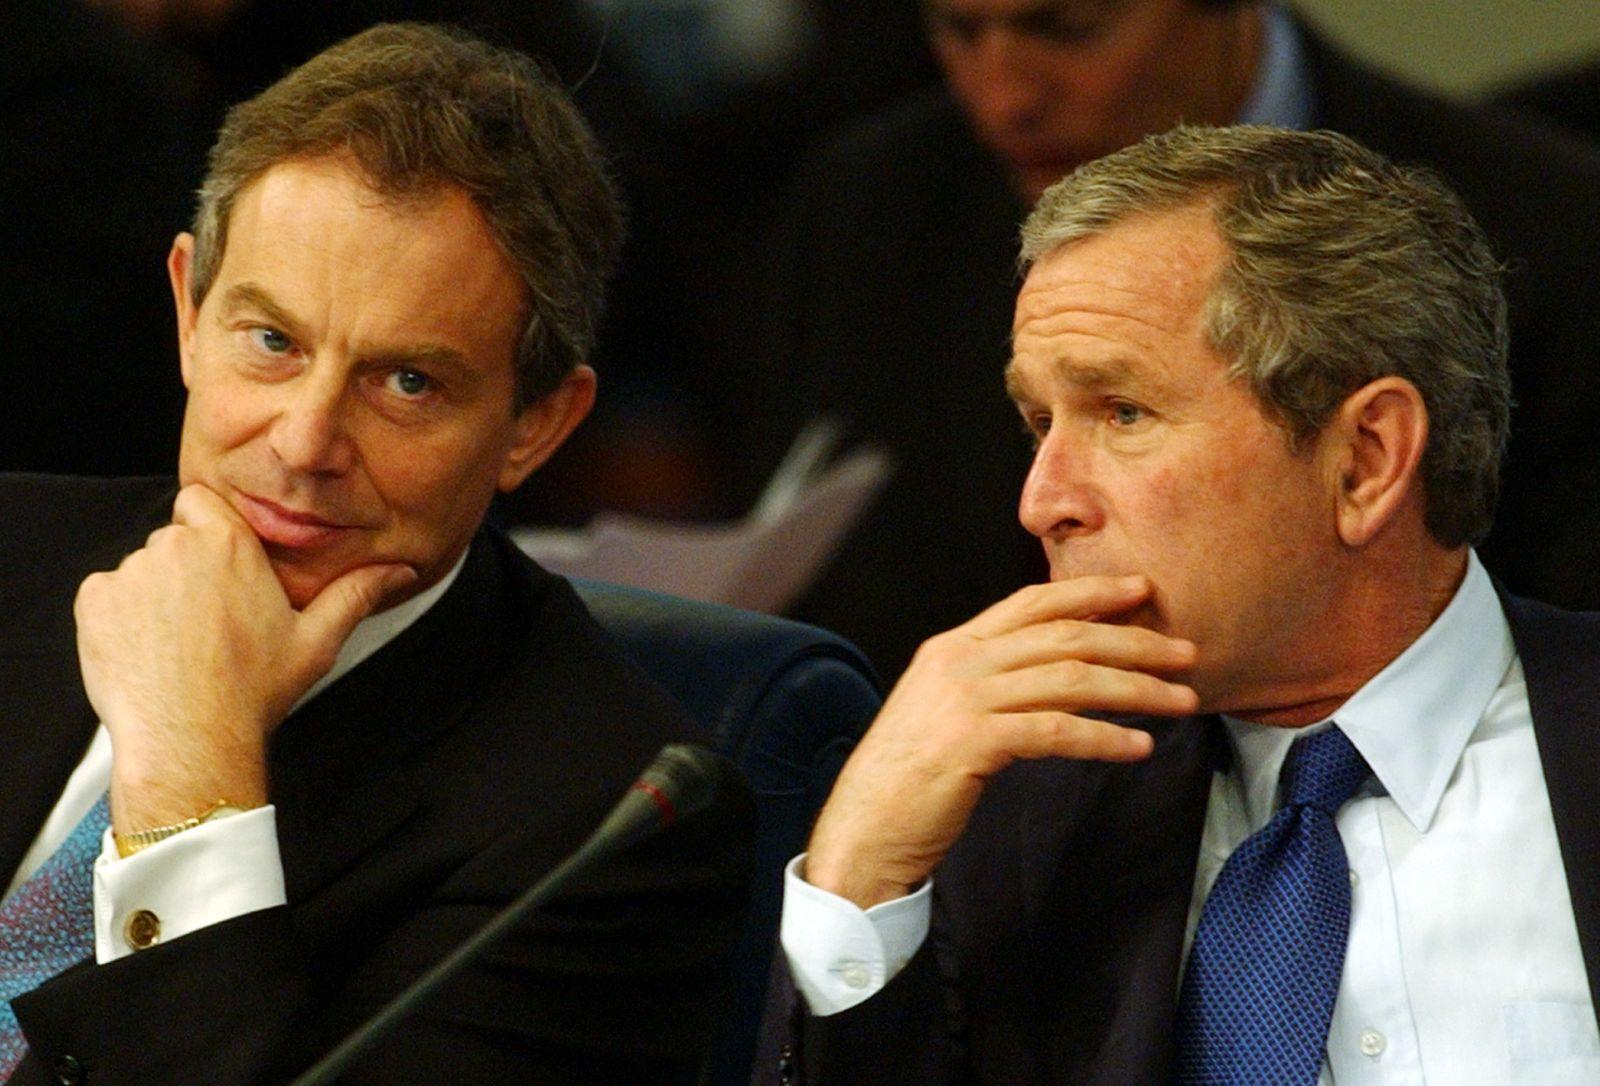 Tony Blair / Memoiren Blair mit Bush